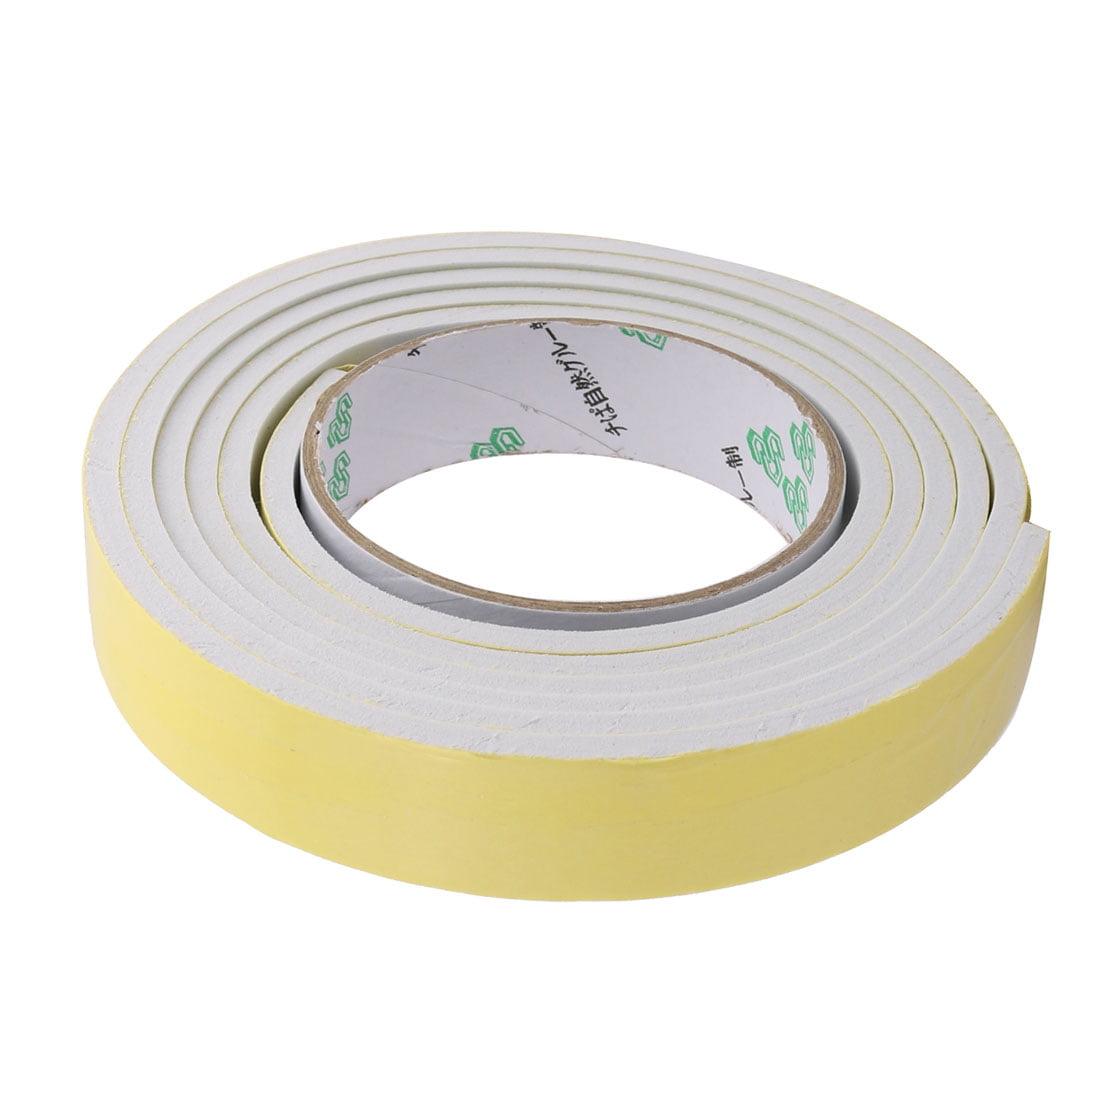 5pcs 3Meter 25mm x 5mm Single-side Adhesive Shockproof Sponge Foam Tape Yellow